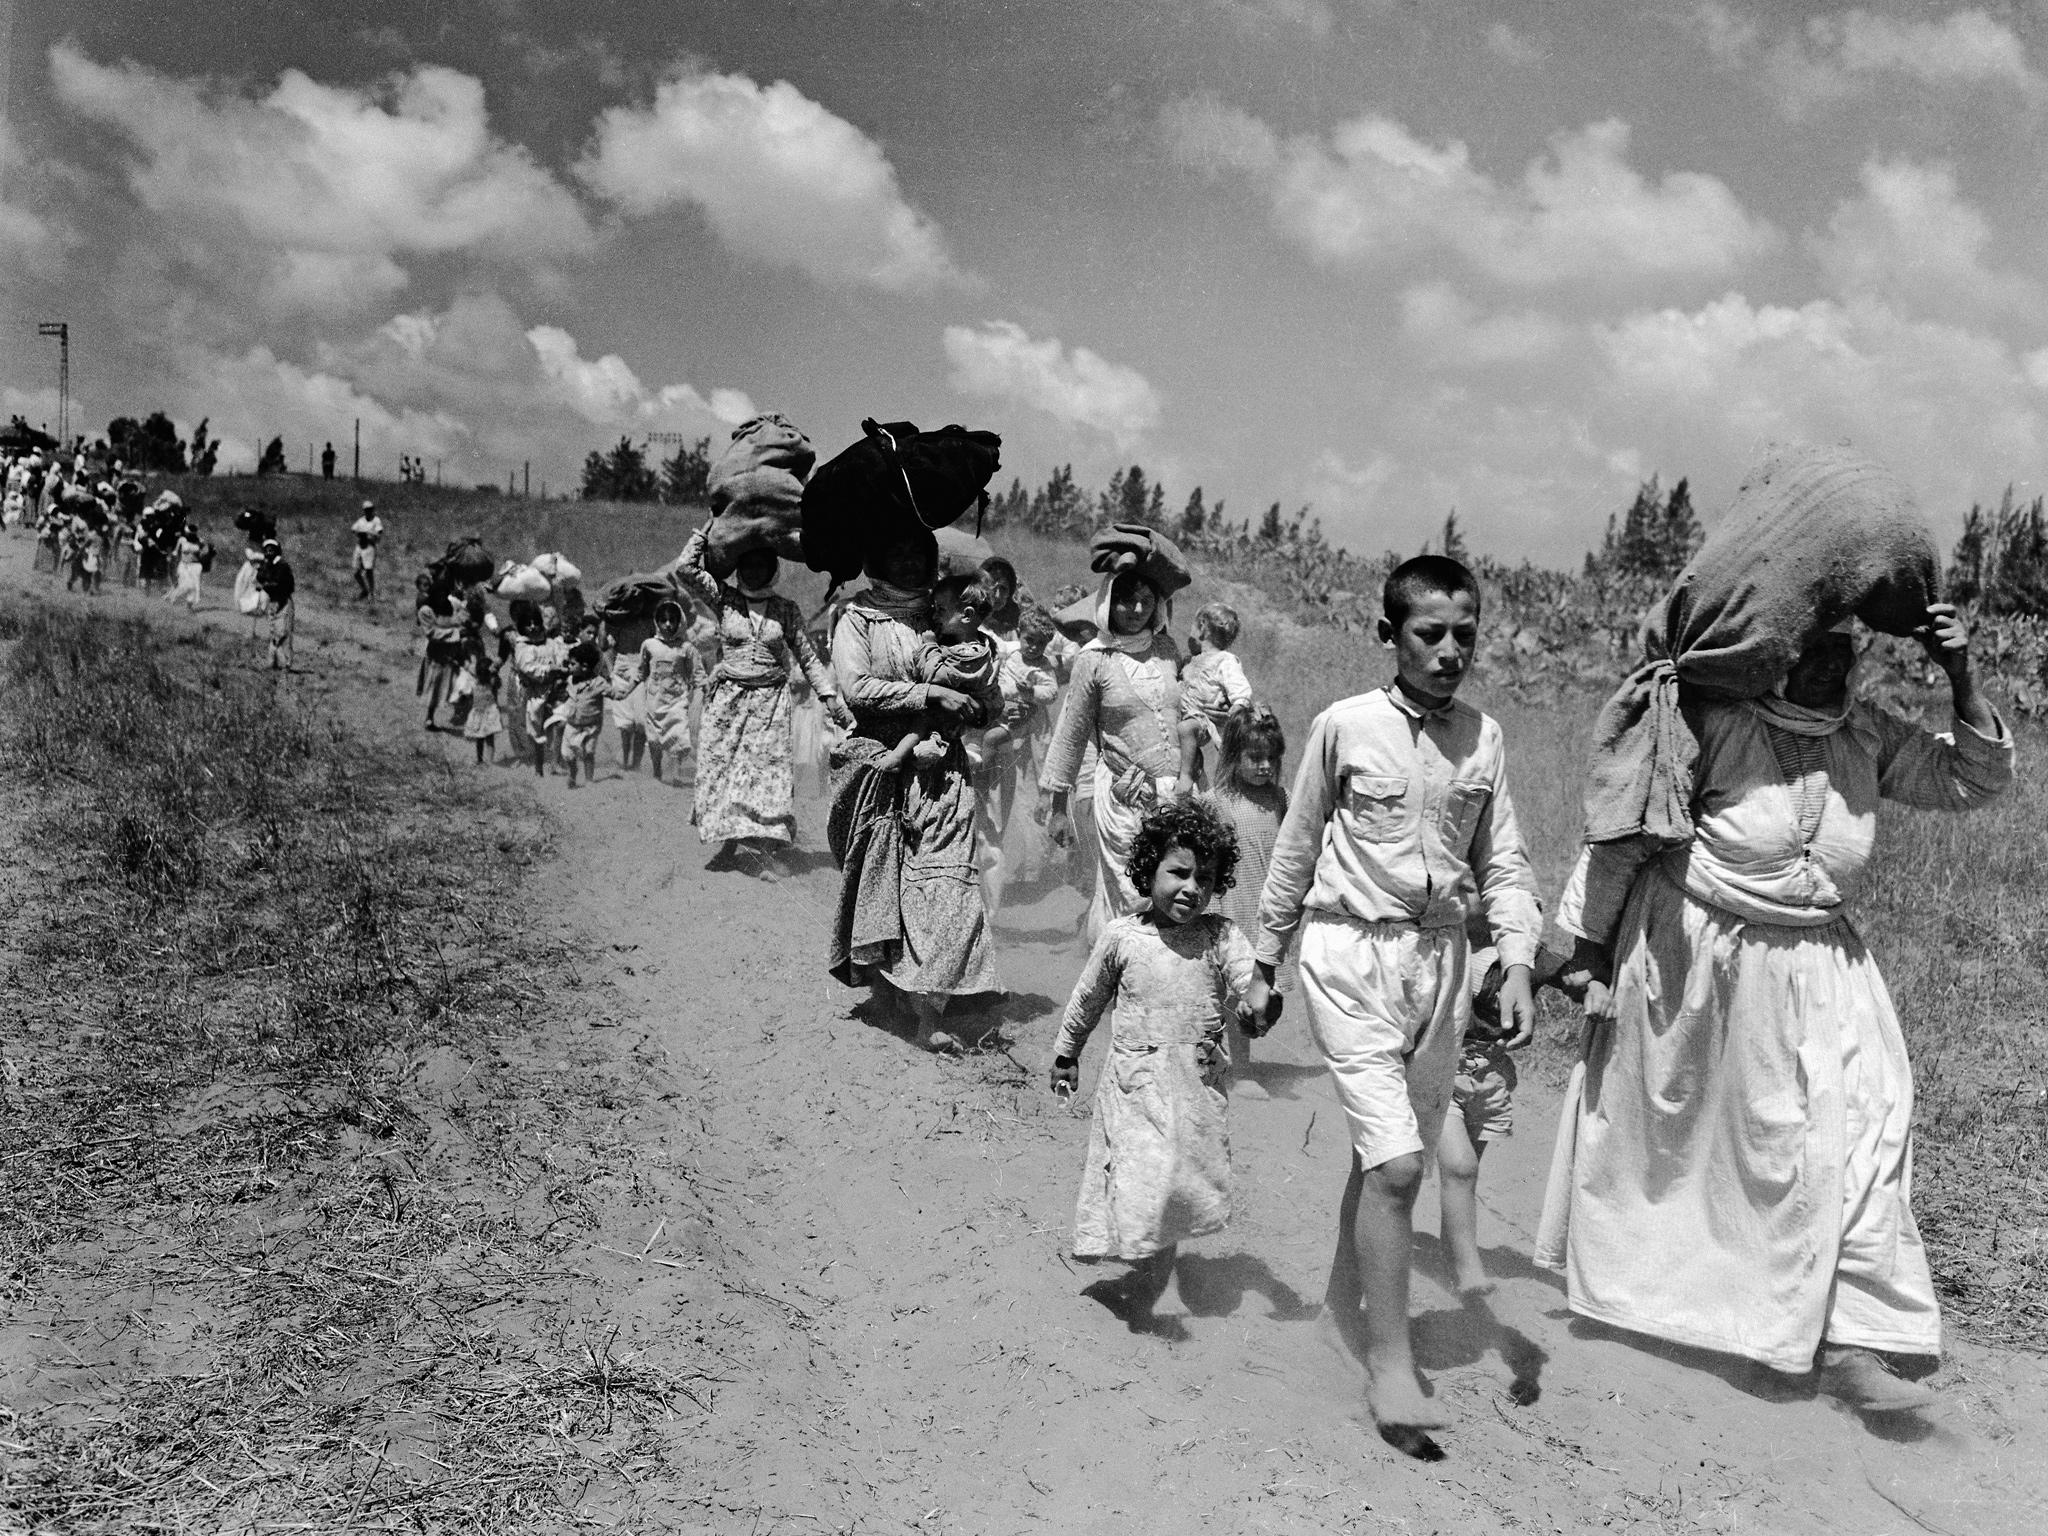 Palestinian refugees leaving a village near Haifa, June 1948. Photo by Corbis.